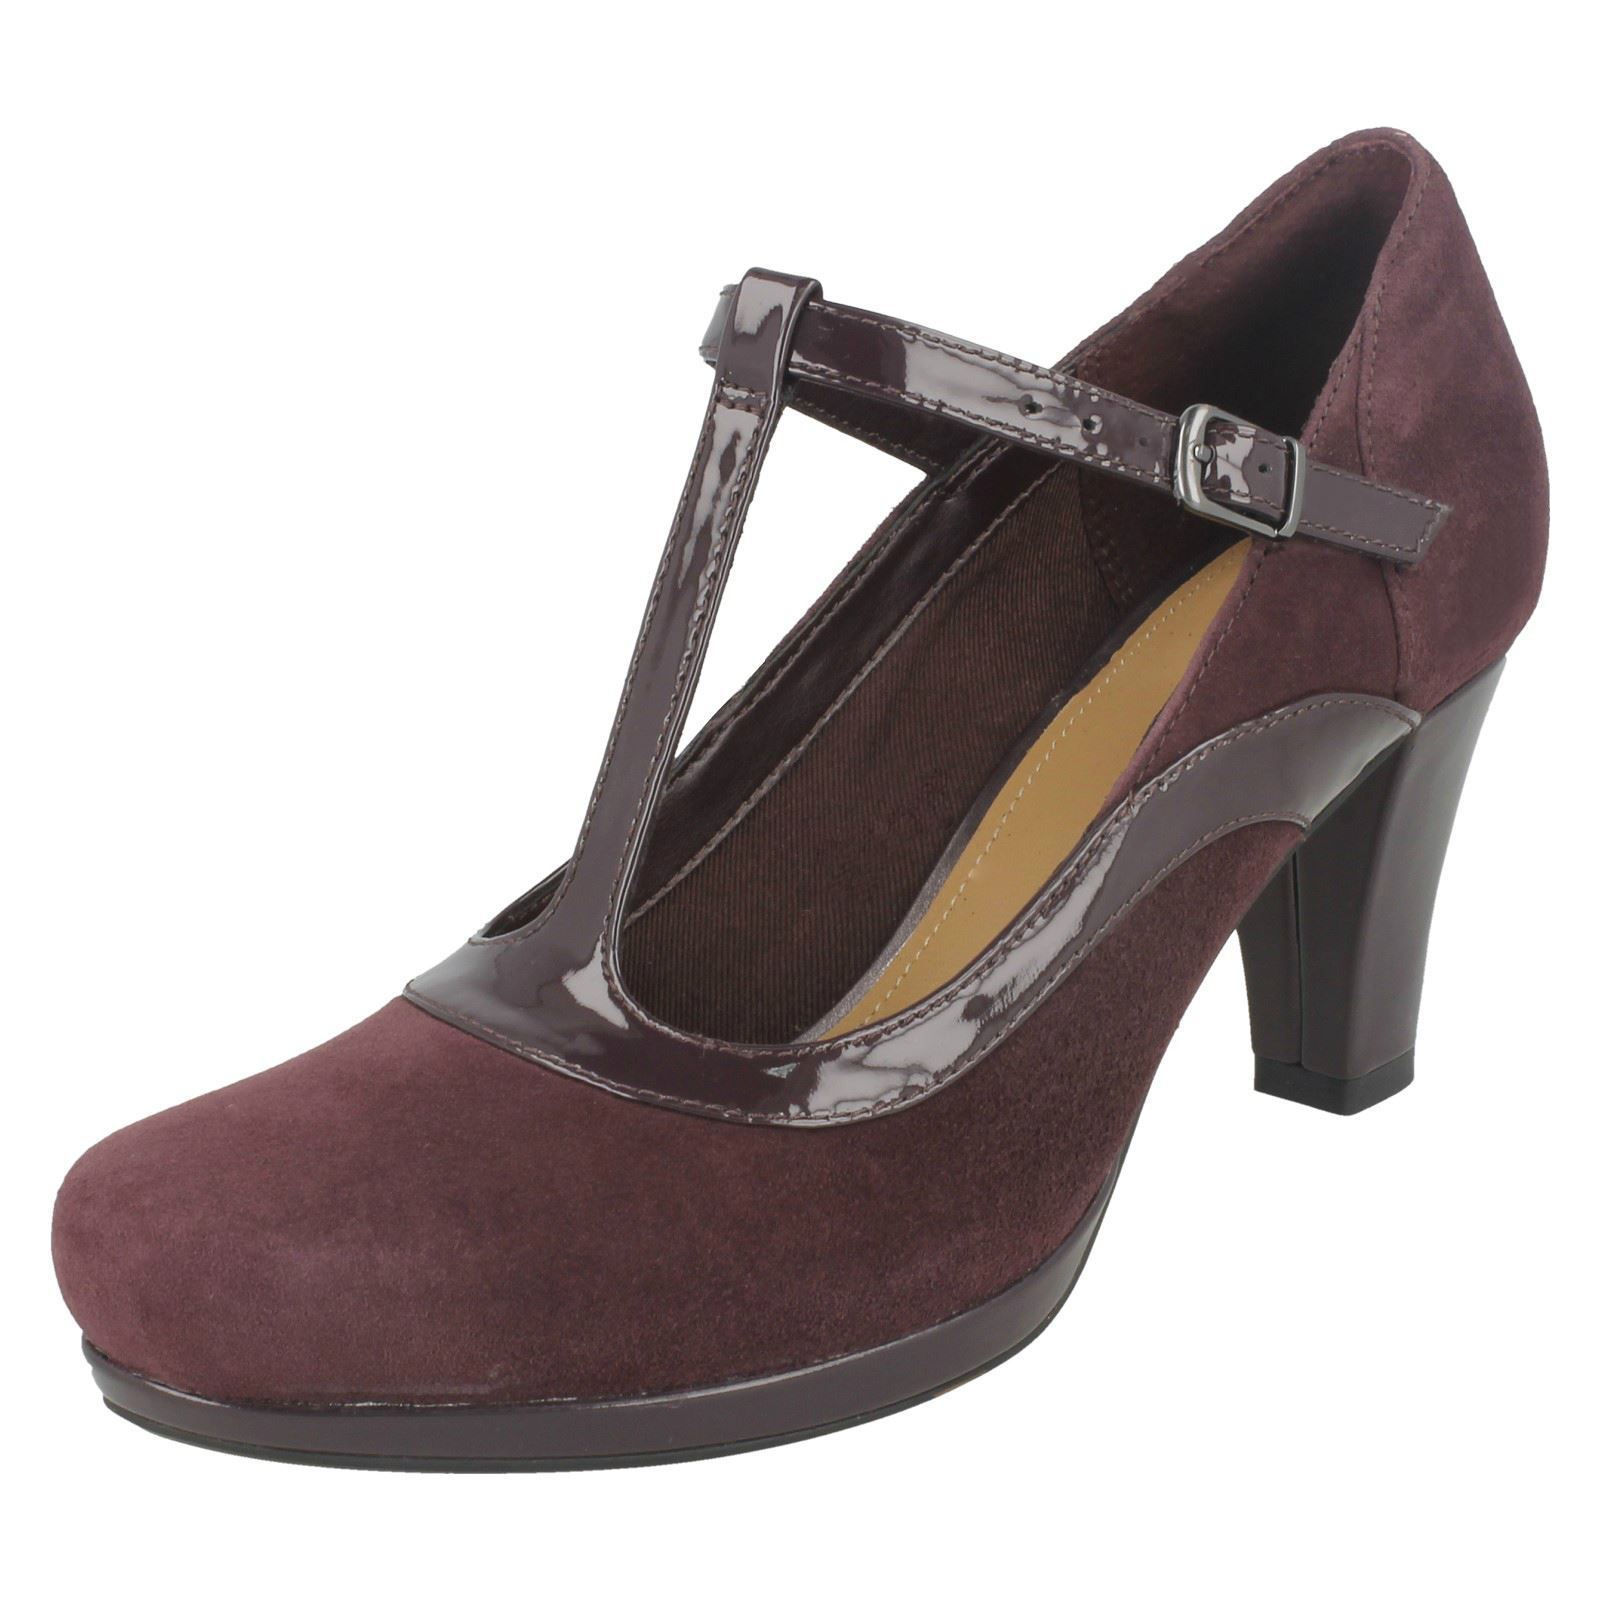 Descuento barato Ladies Clarks Court Heel Shoes Chorus Pitch